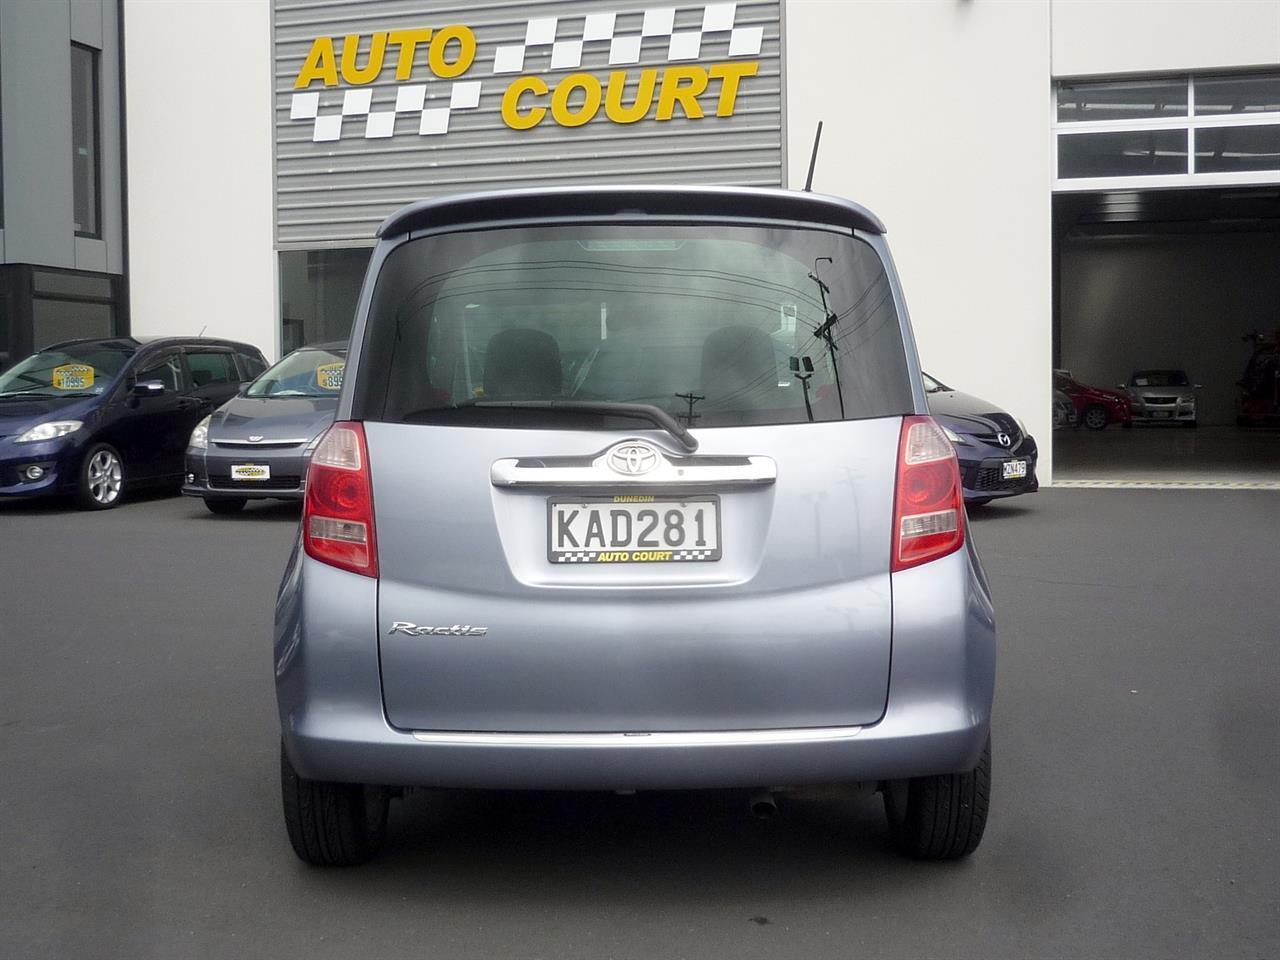 image-16, 2006 Toyota Ractis at Dunedin